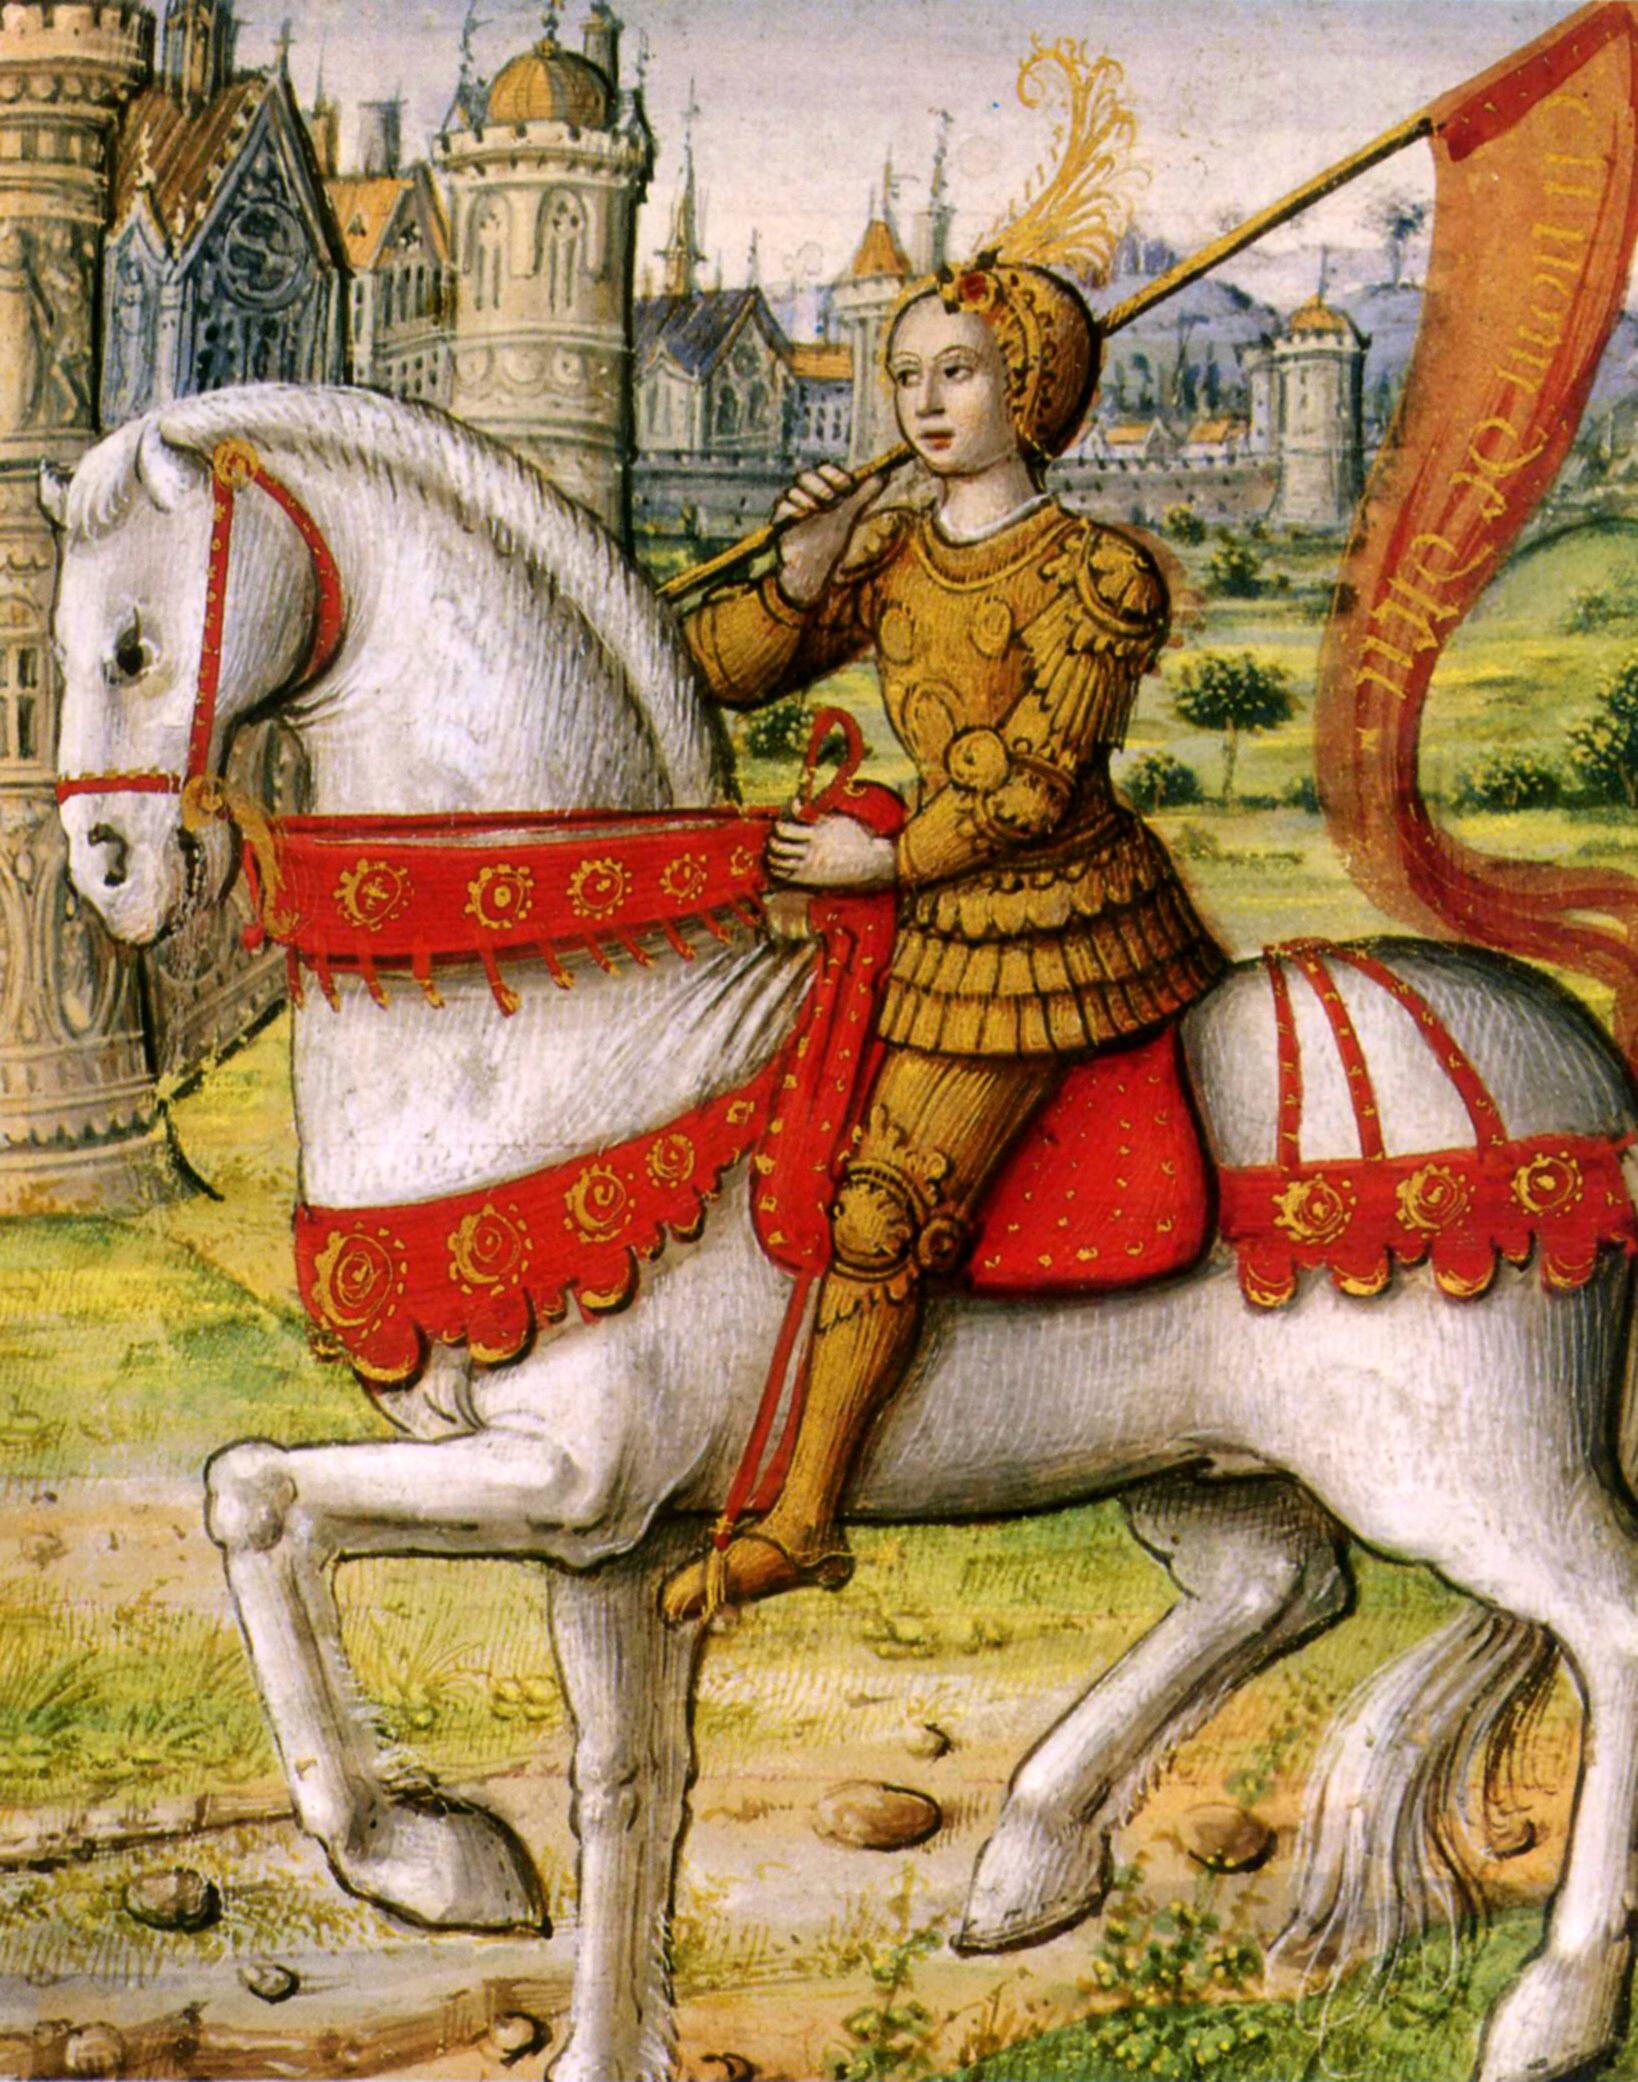 Joan of Arc depicted on horseback in a miniature illustration from the manuscript Les vies des femmes célèbres d'Antoine Dufour, illuminatioin on parchment, 1504. Currently in the Musée Dobrée, Nantes, France.